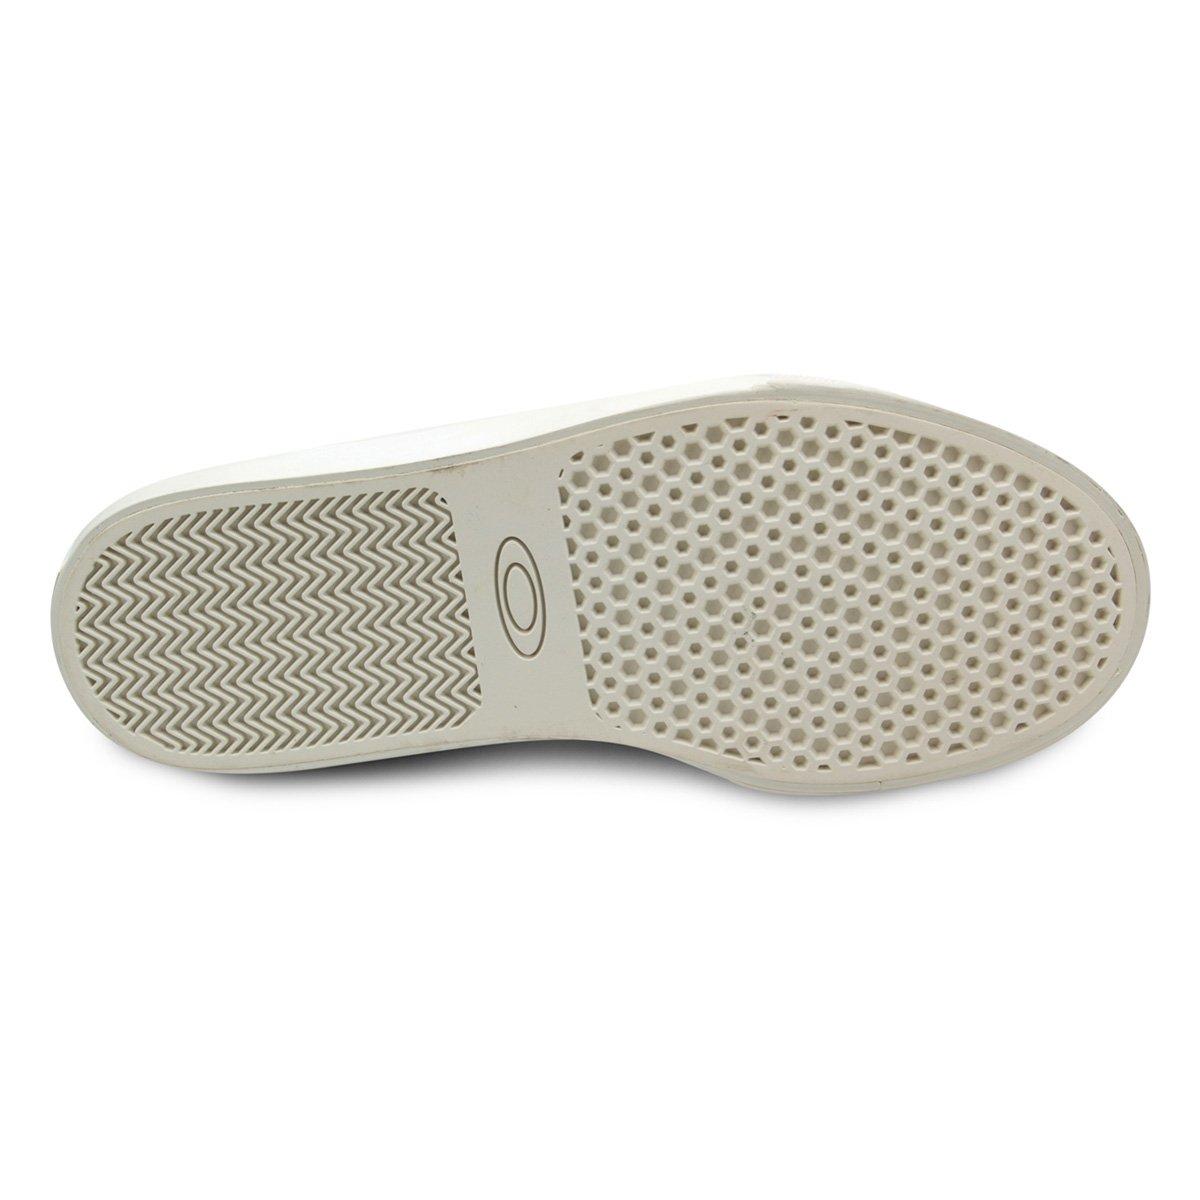 577f53d172ce1 Tênis Oakley Liv Masculino - Bege - Compre Agora   Netshoes